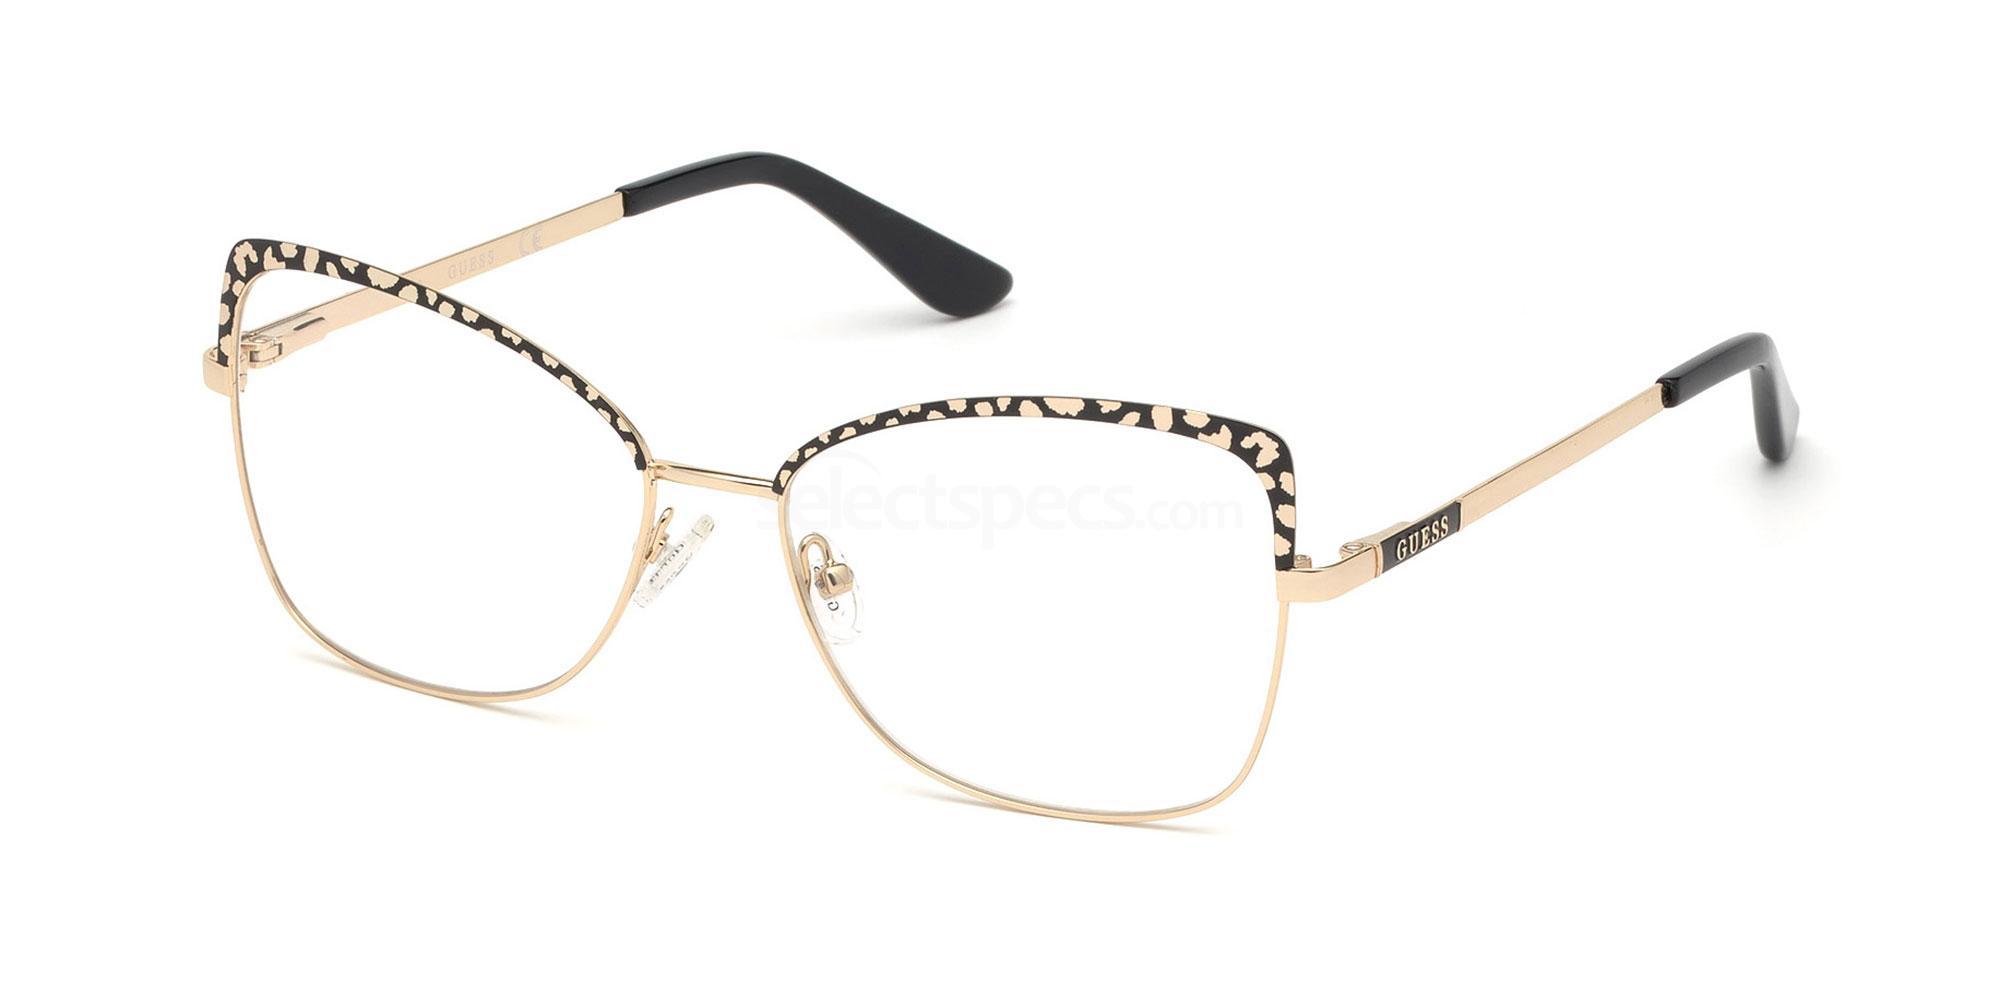 001 GU2716 Glasses, Guess